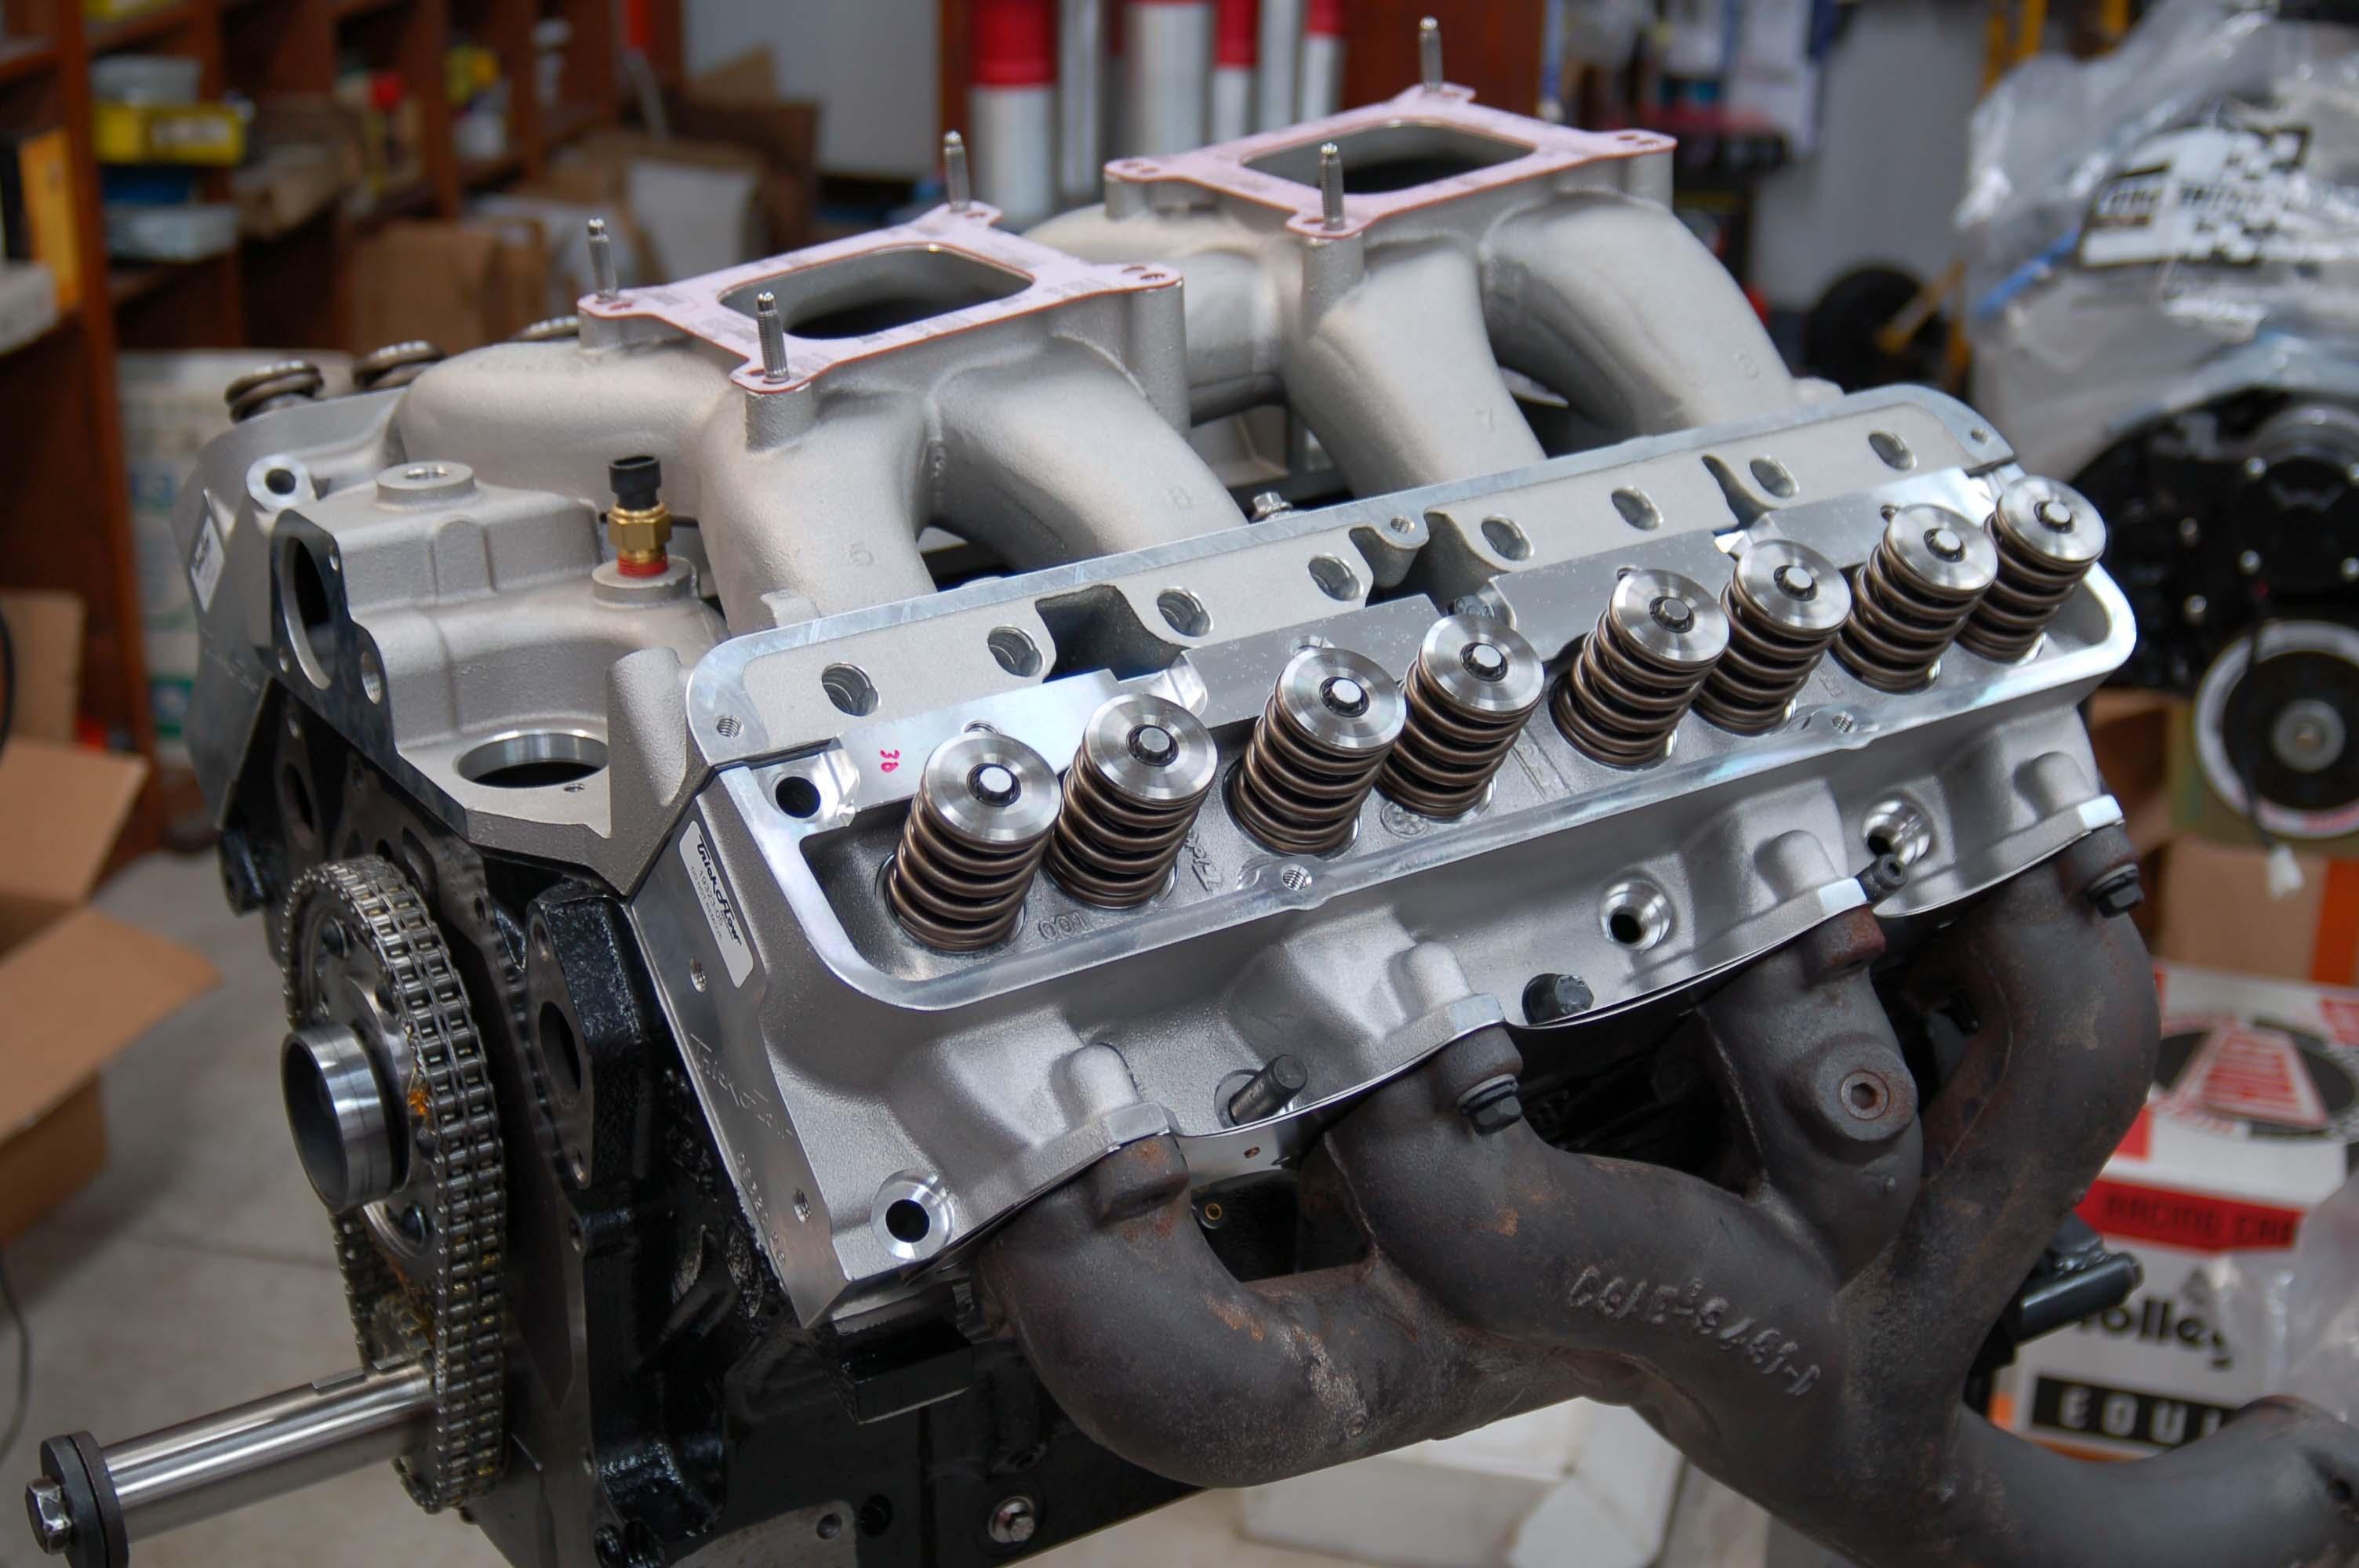 Ford 352 Engine Specs Diagram Blog Industries Automotive Components Performance 3008x2000